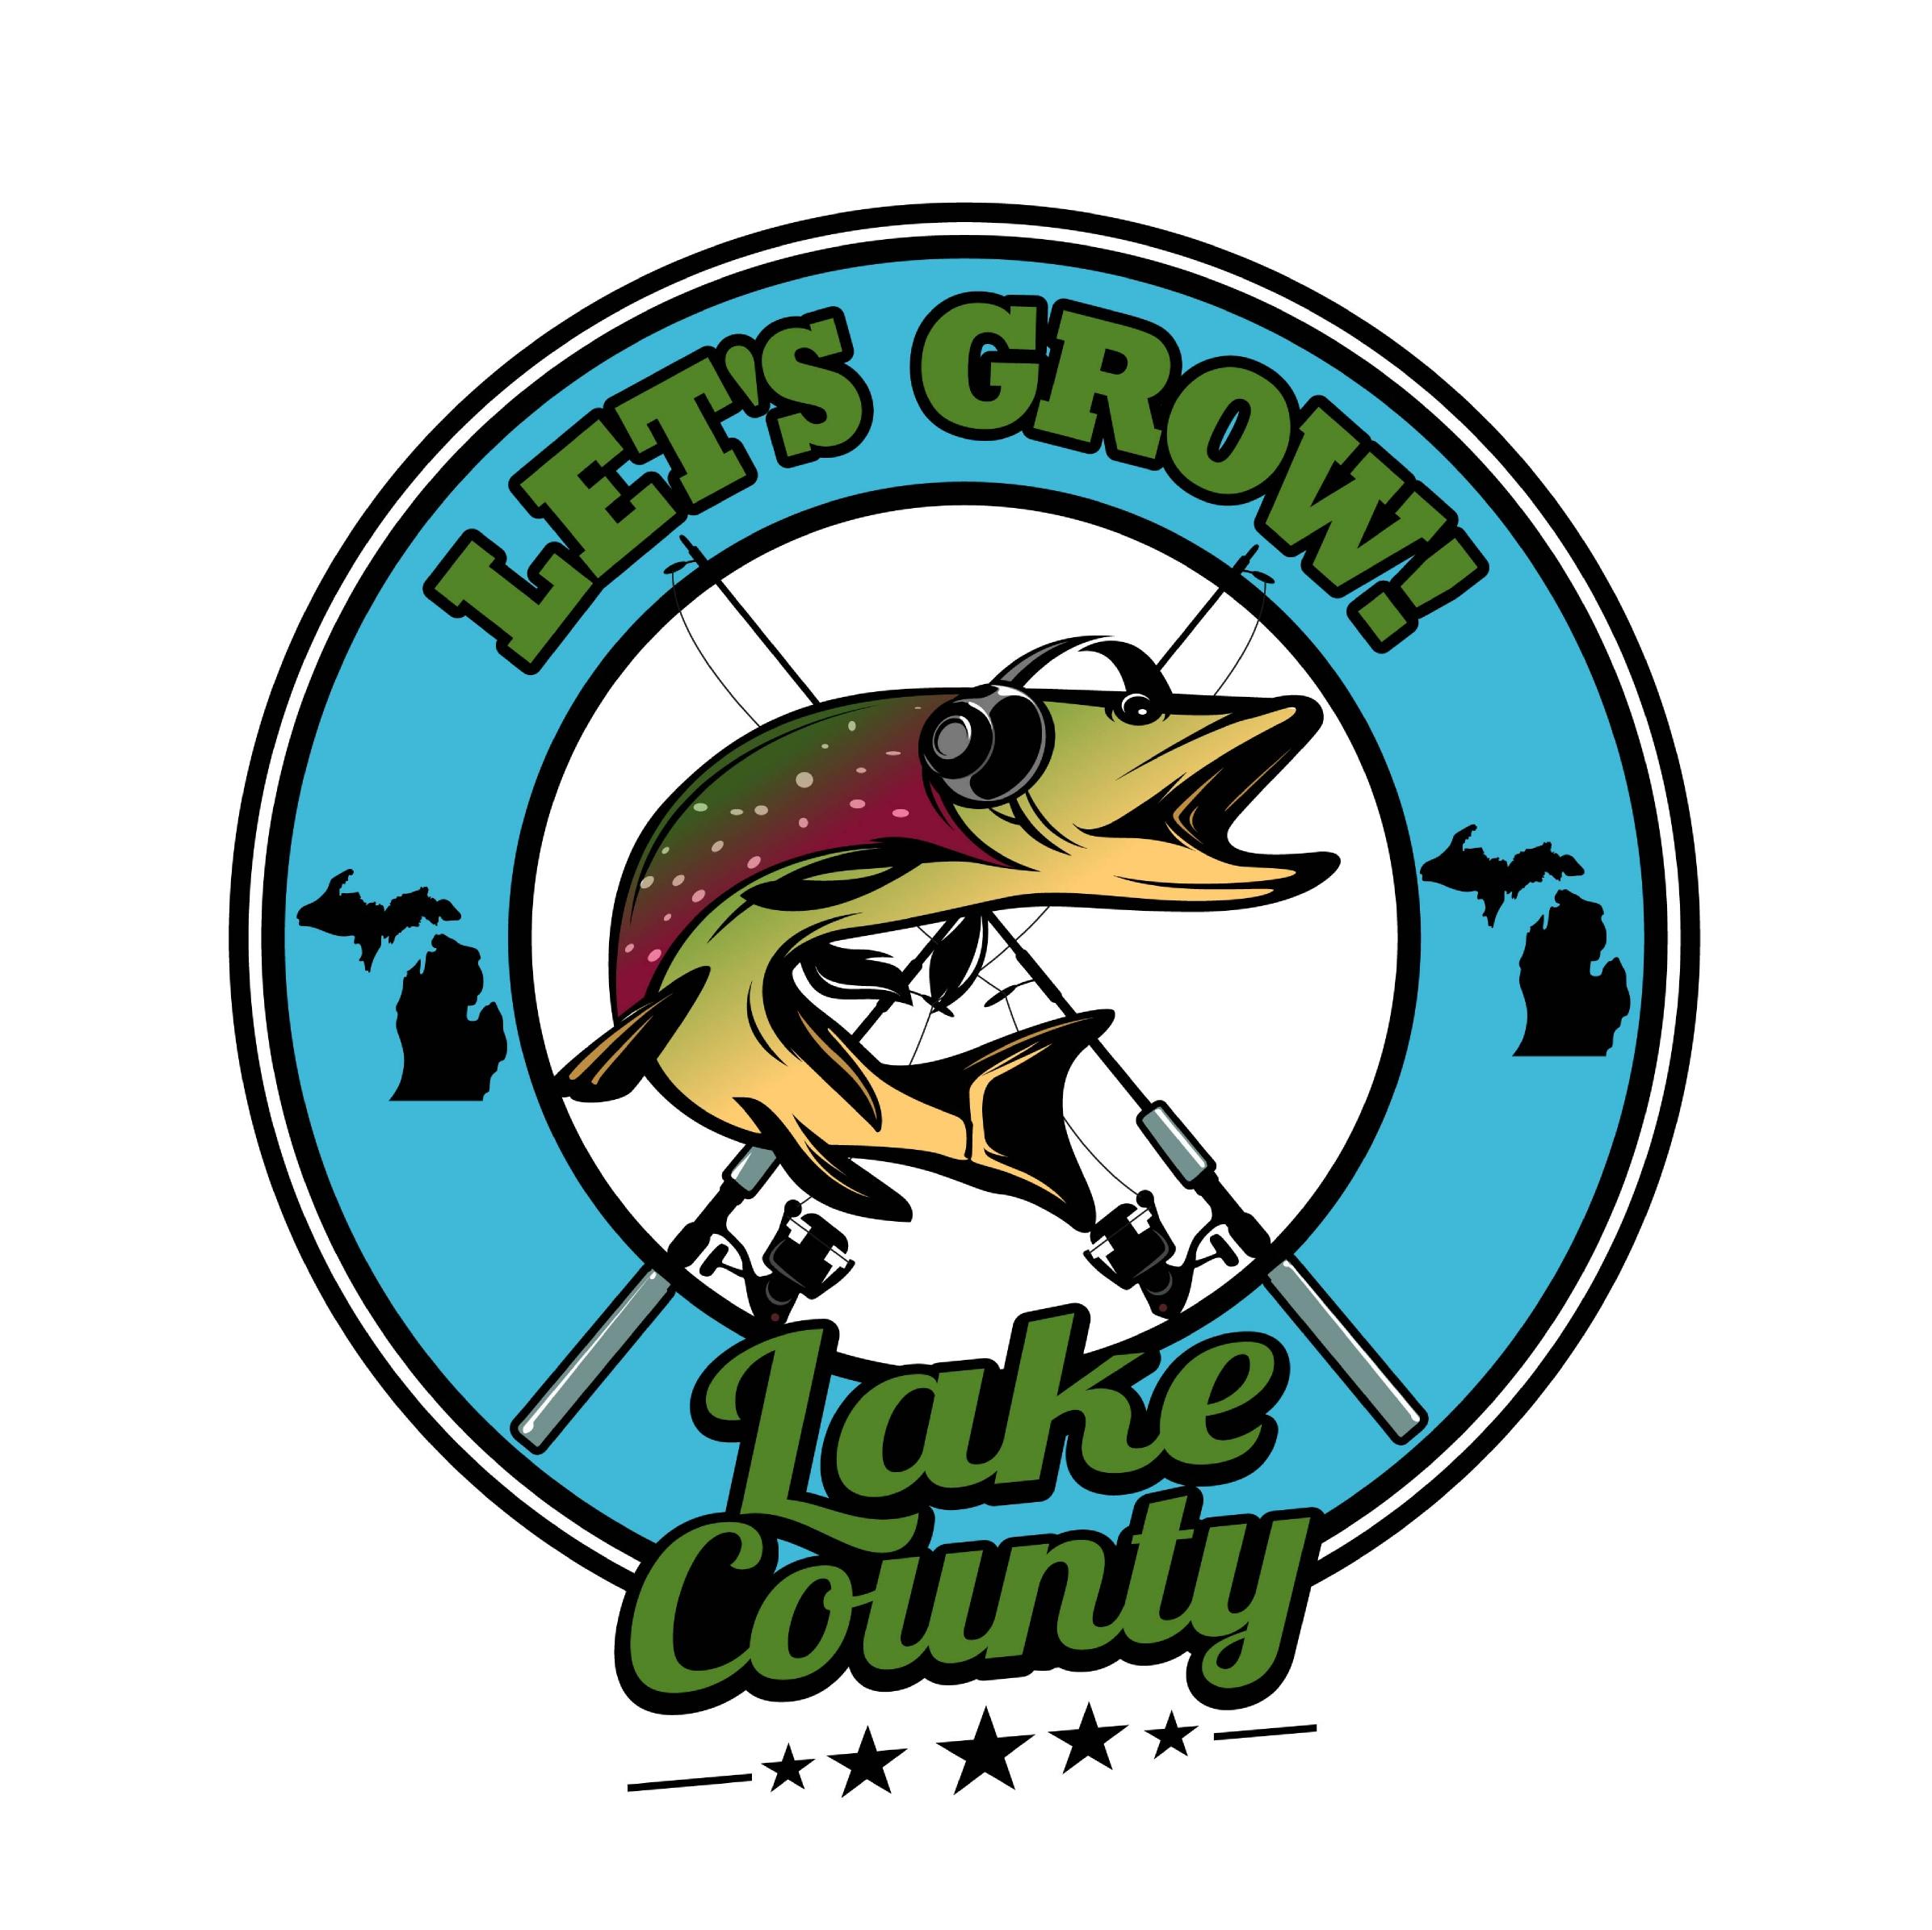 Let's Grow! Lake County show art